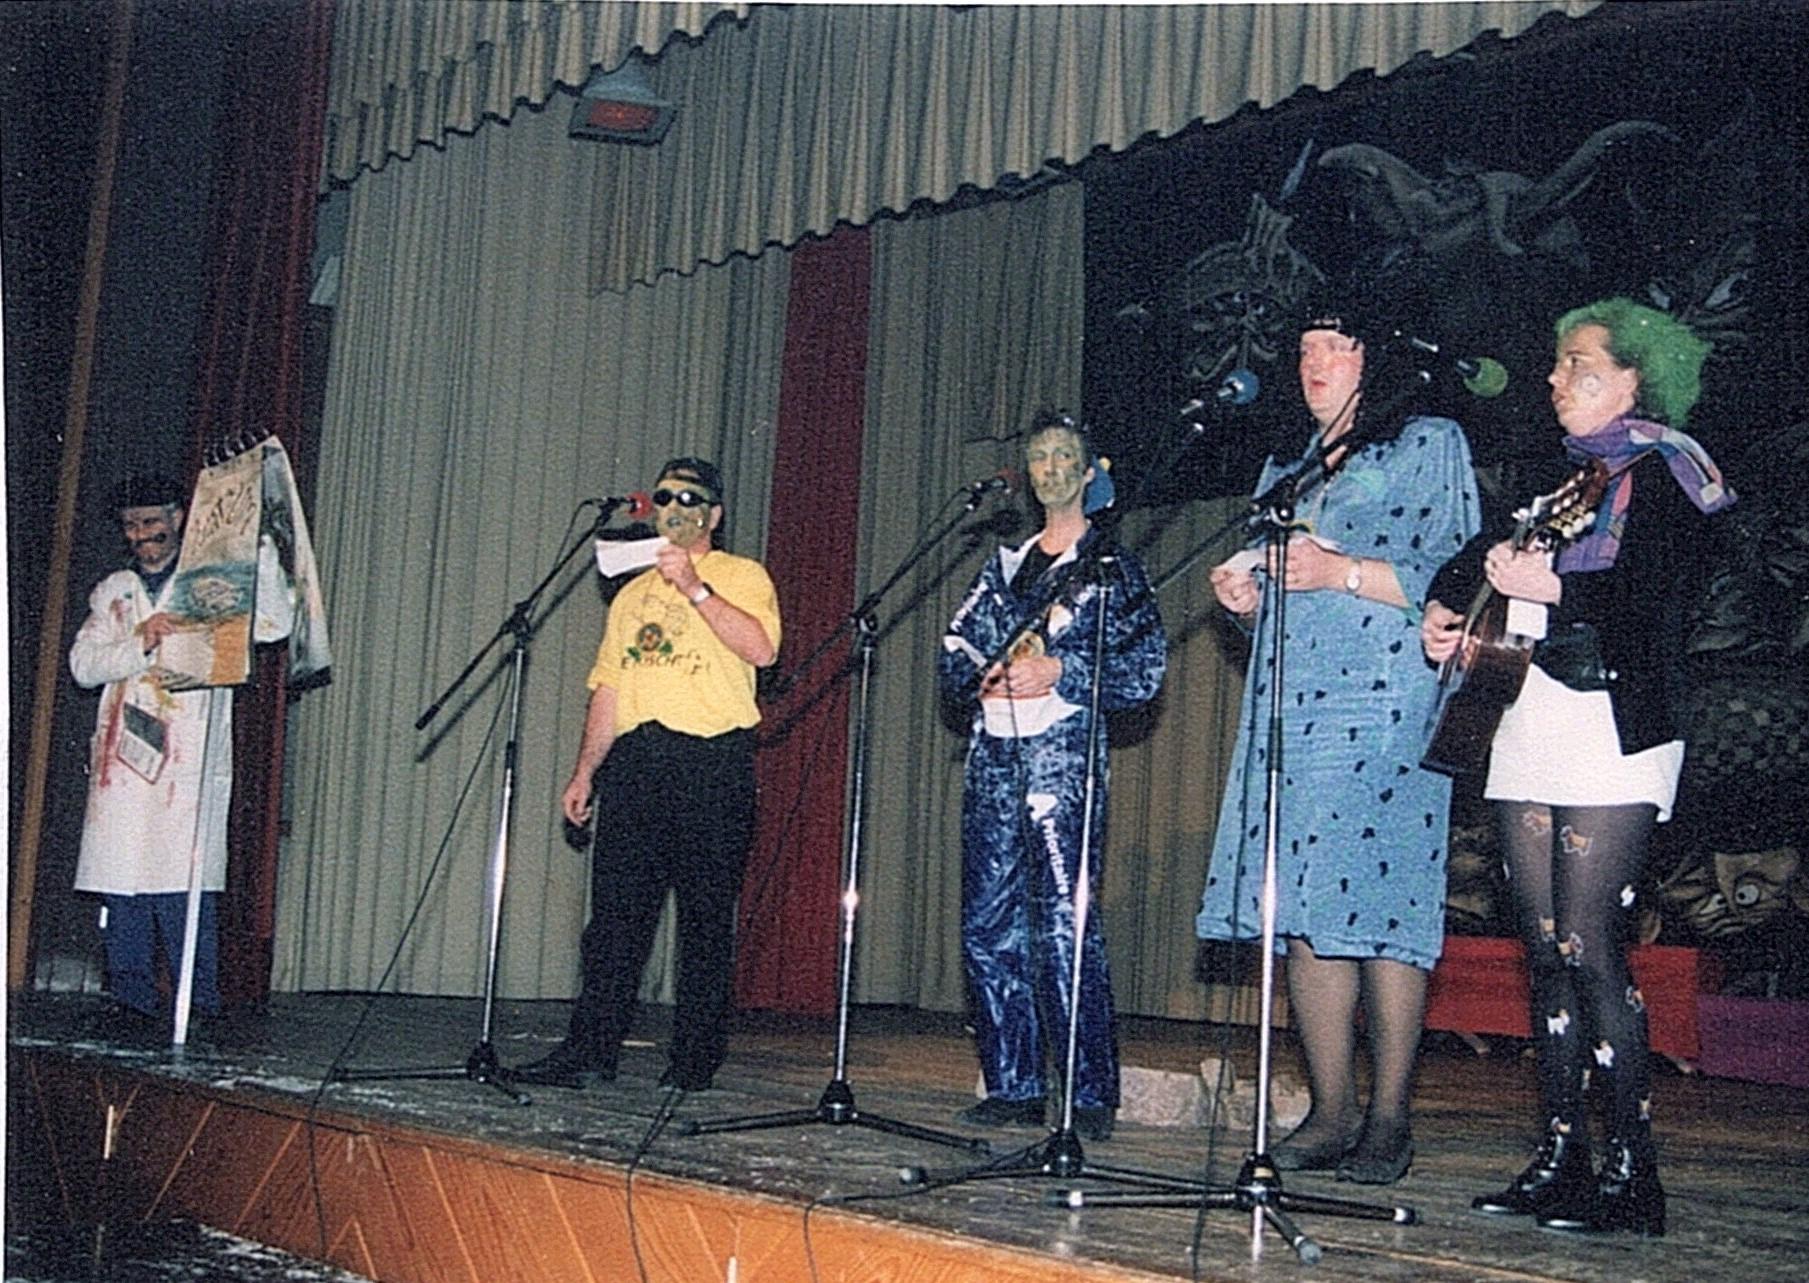 2000 Singfrösche